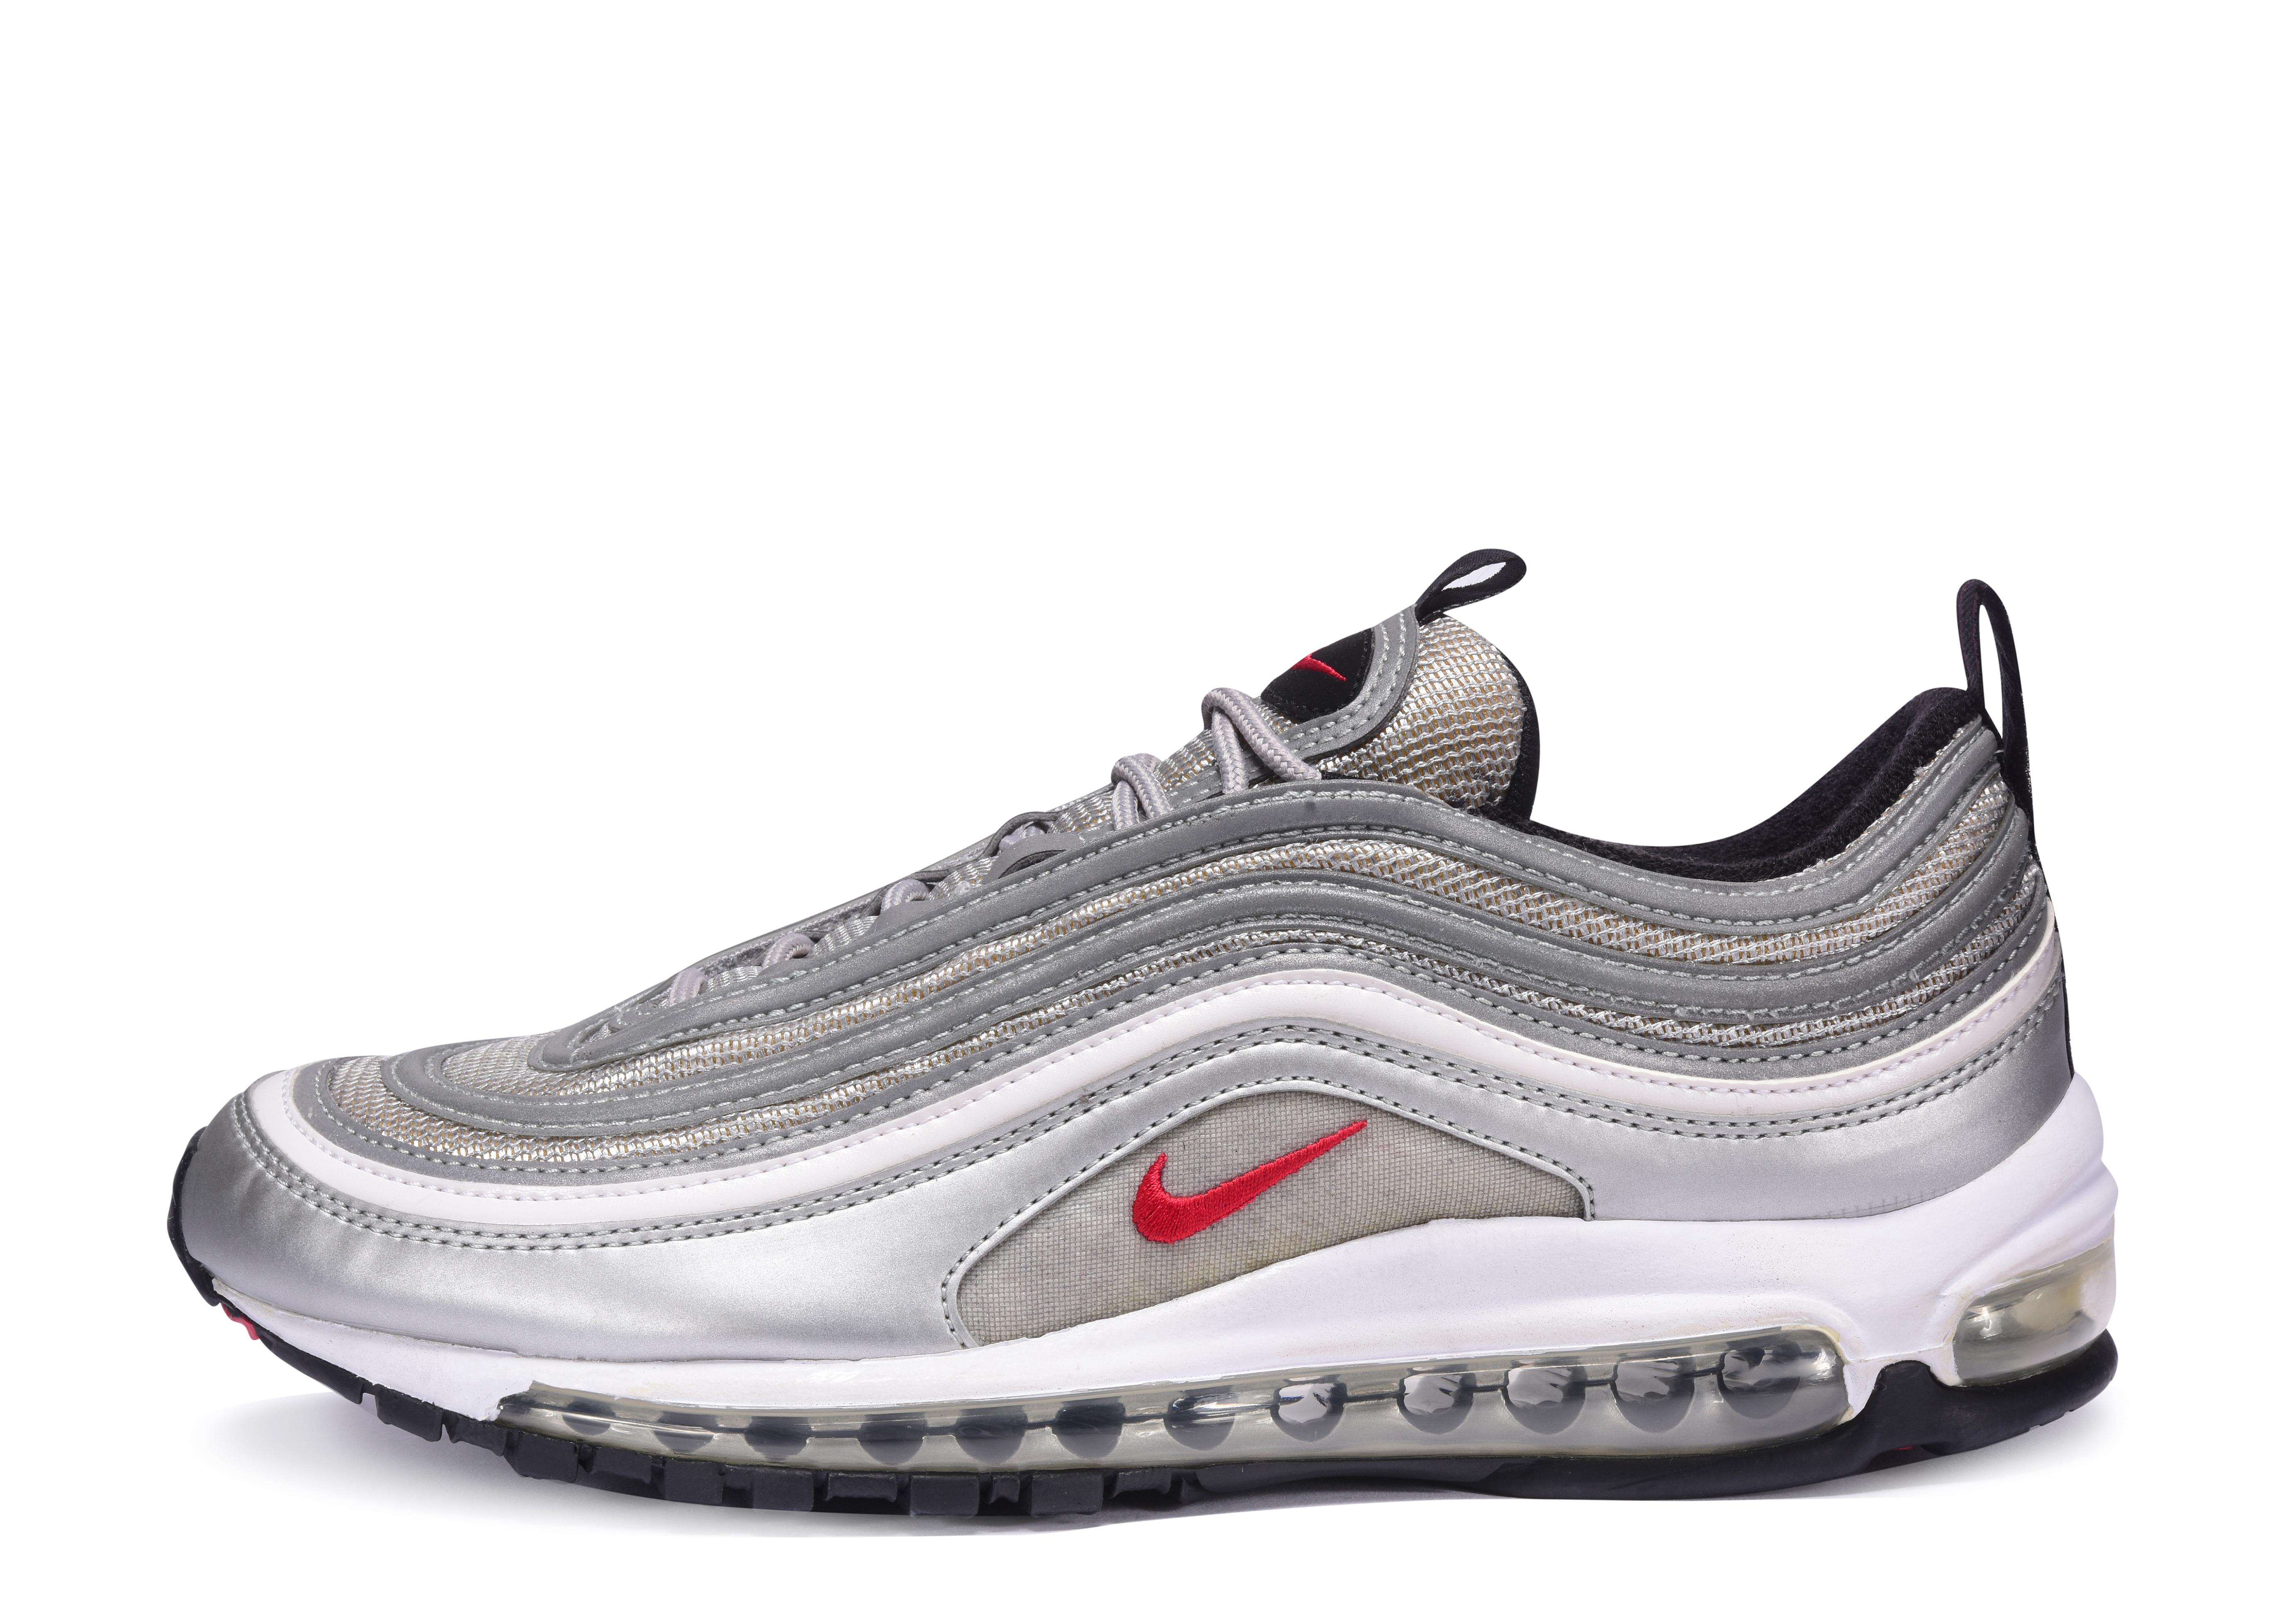 Nike AM 97 OG Metallic Silver Rusty Red